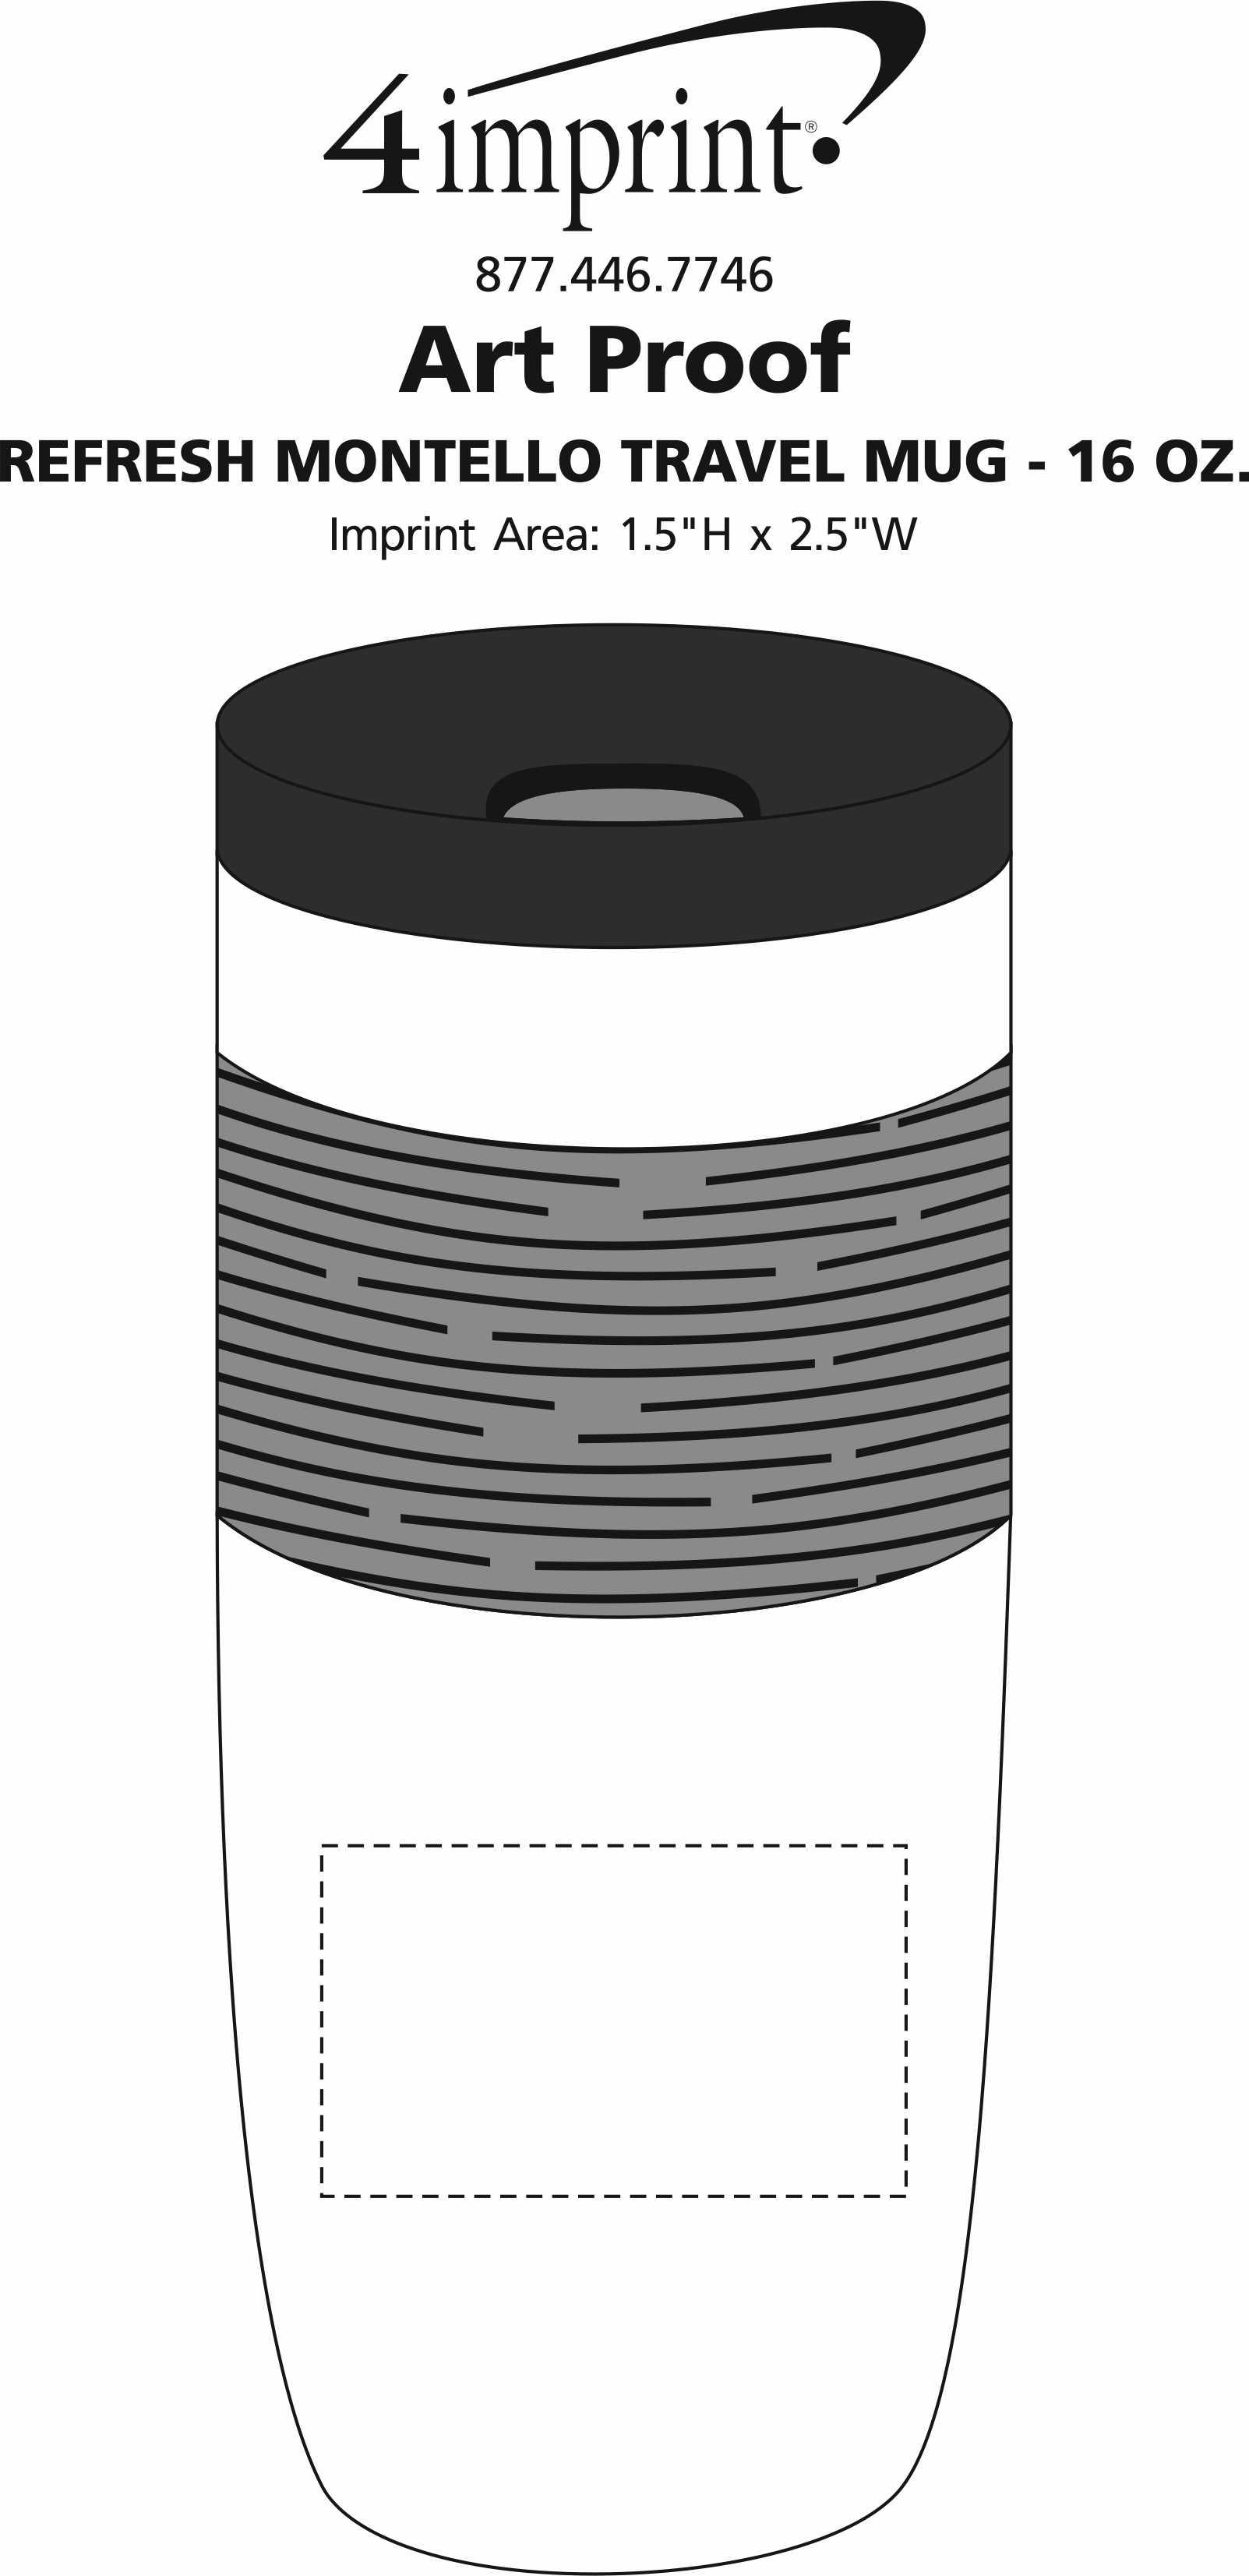 Imprint Area of Refresh Montello Travel Mug - 16 oz.